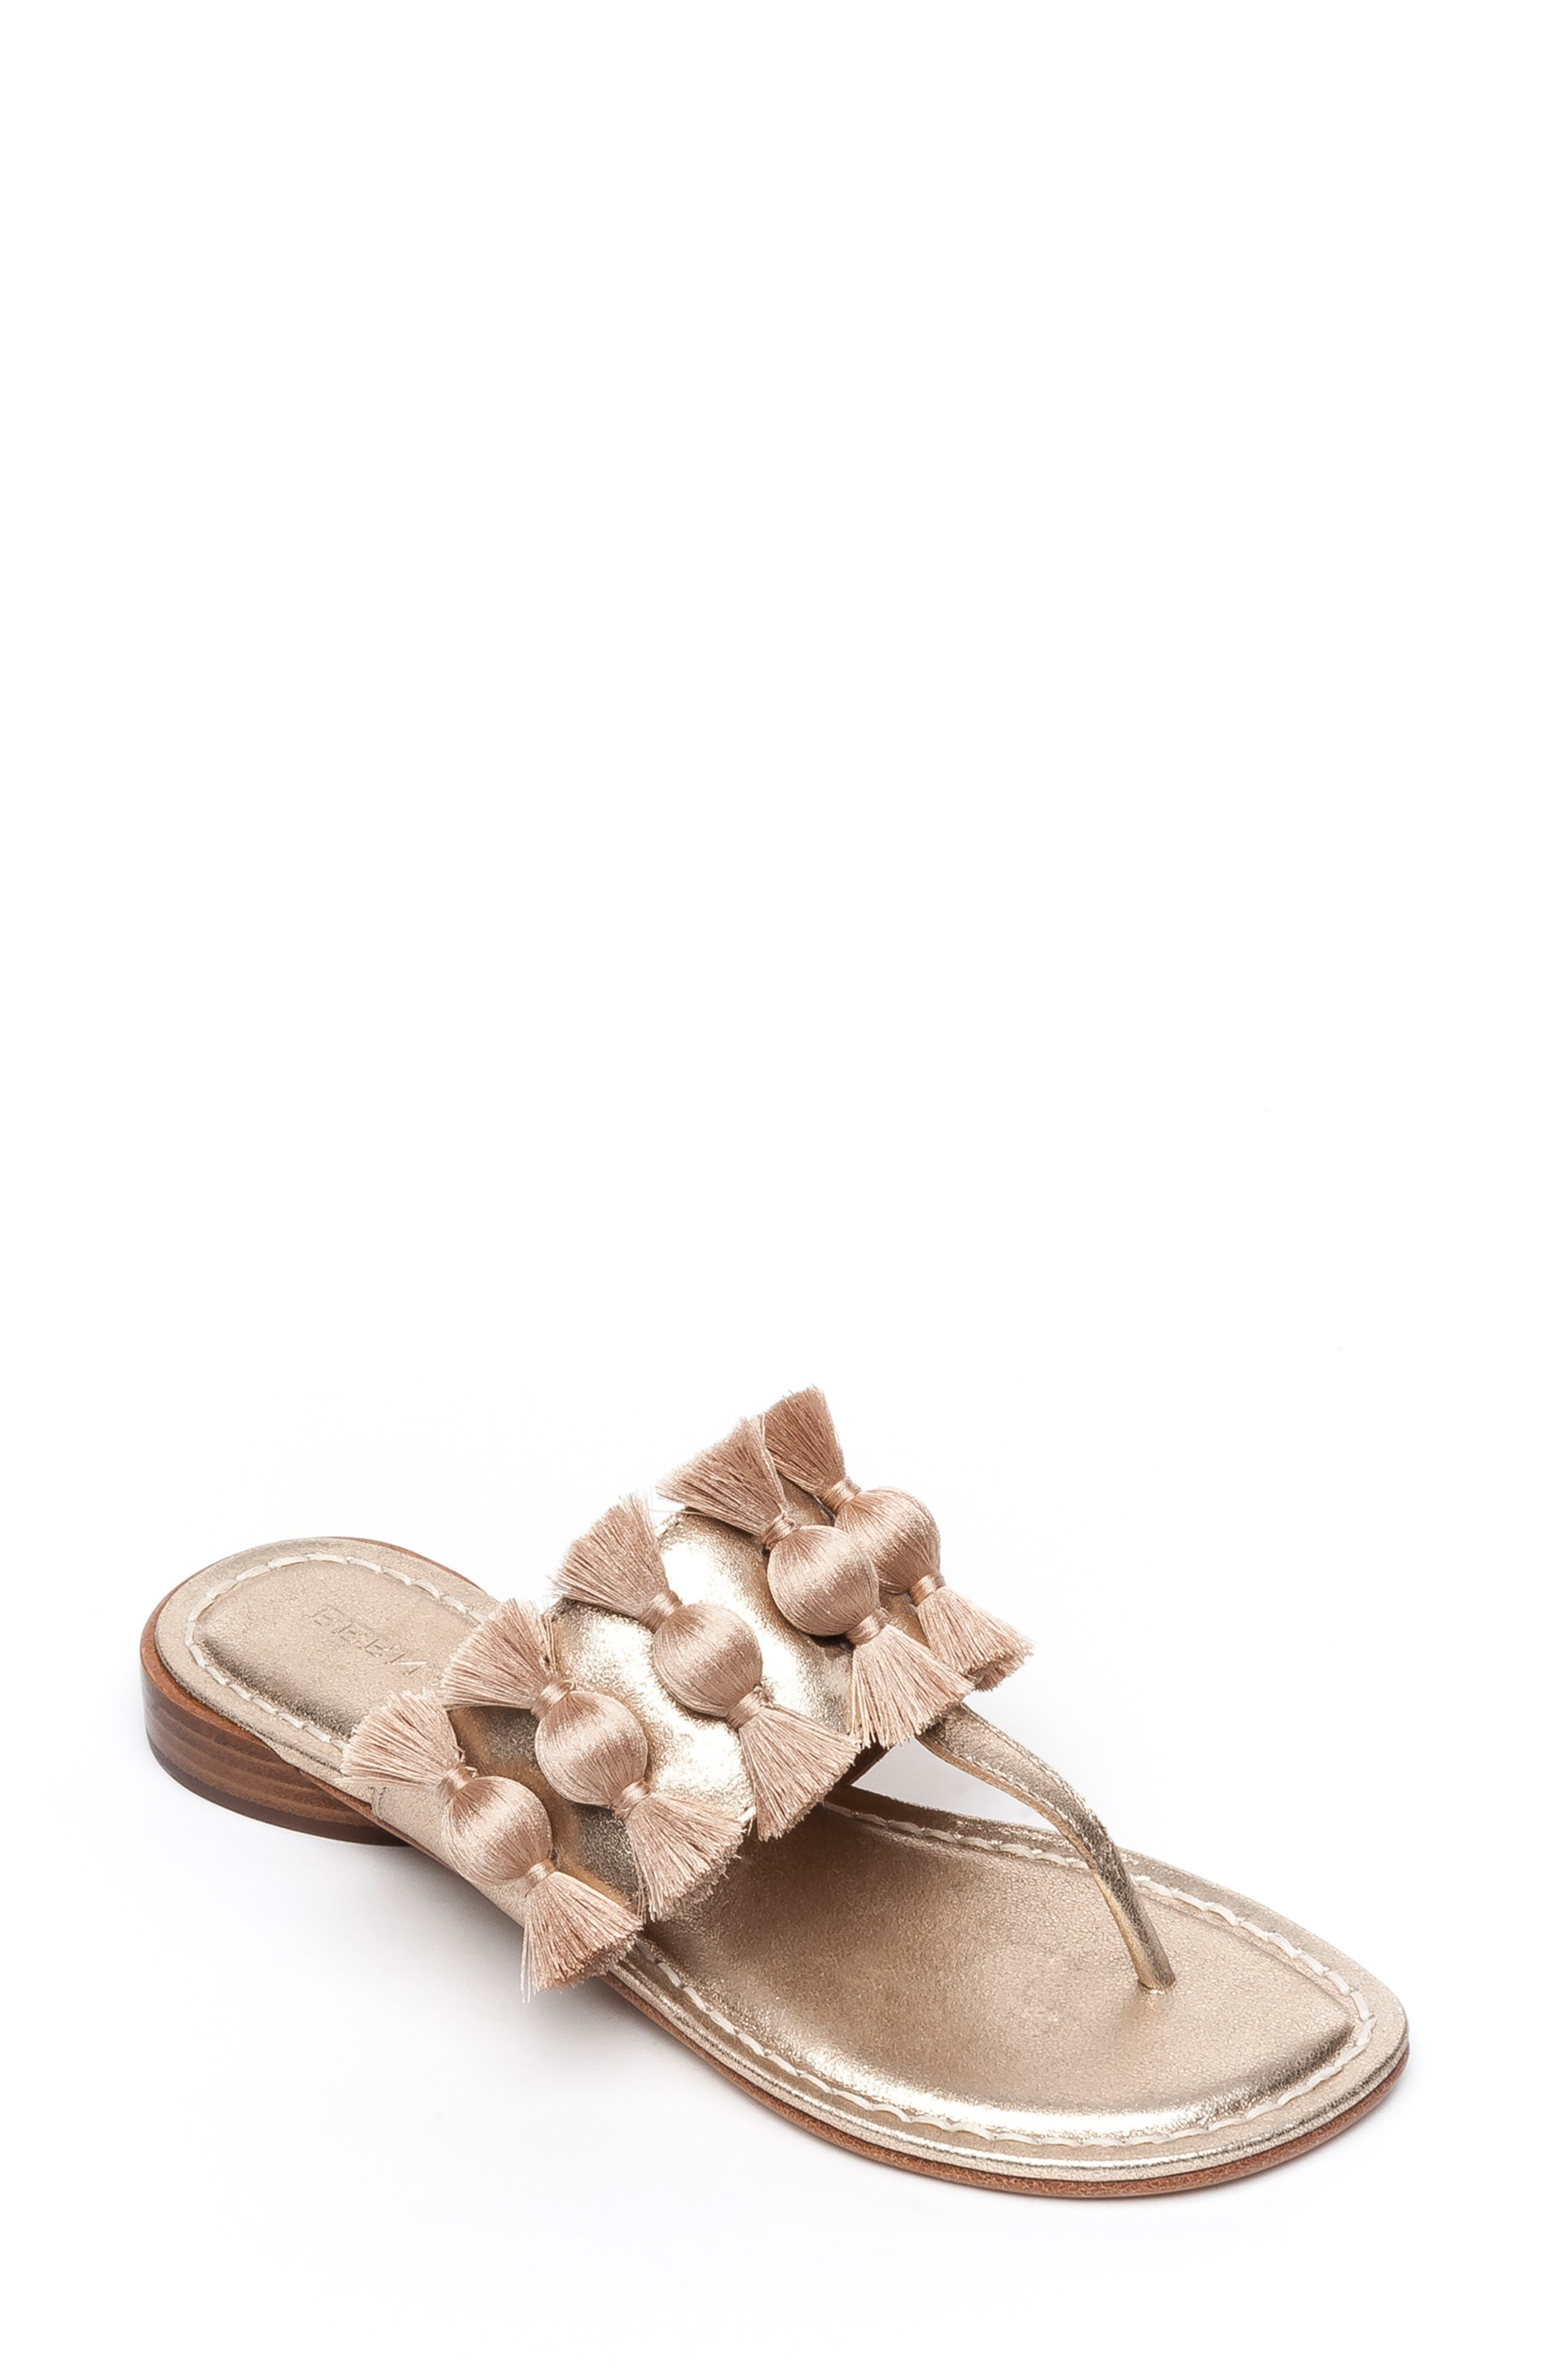 Bernardo Footwear Tara Flip Flop- Metallic